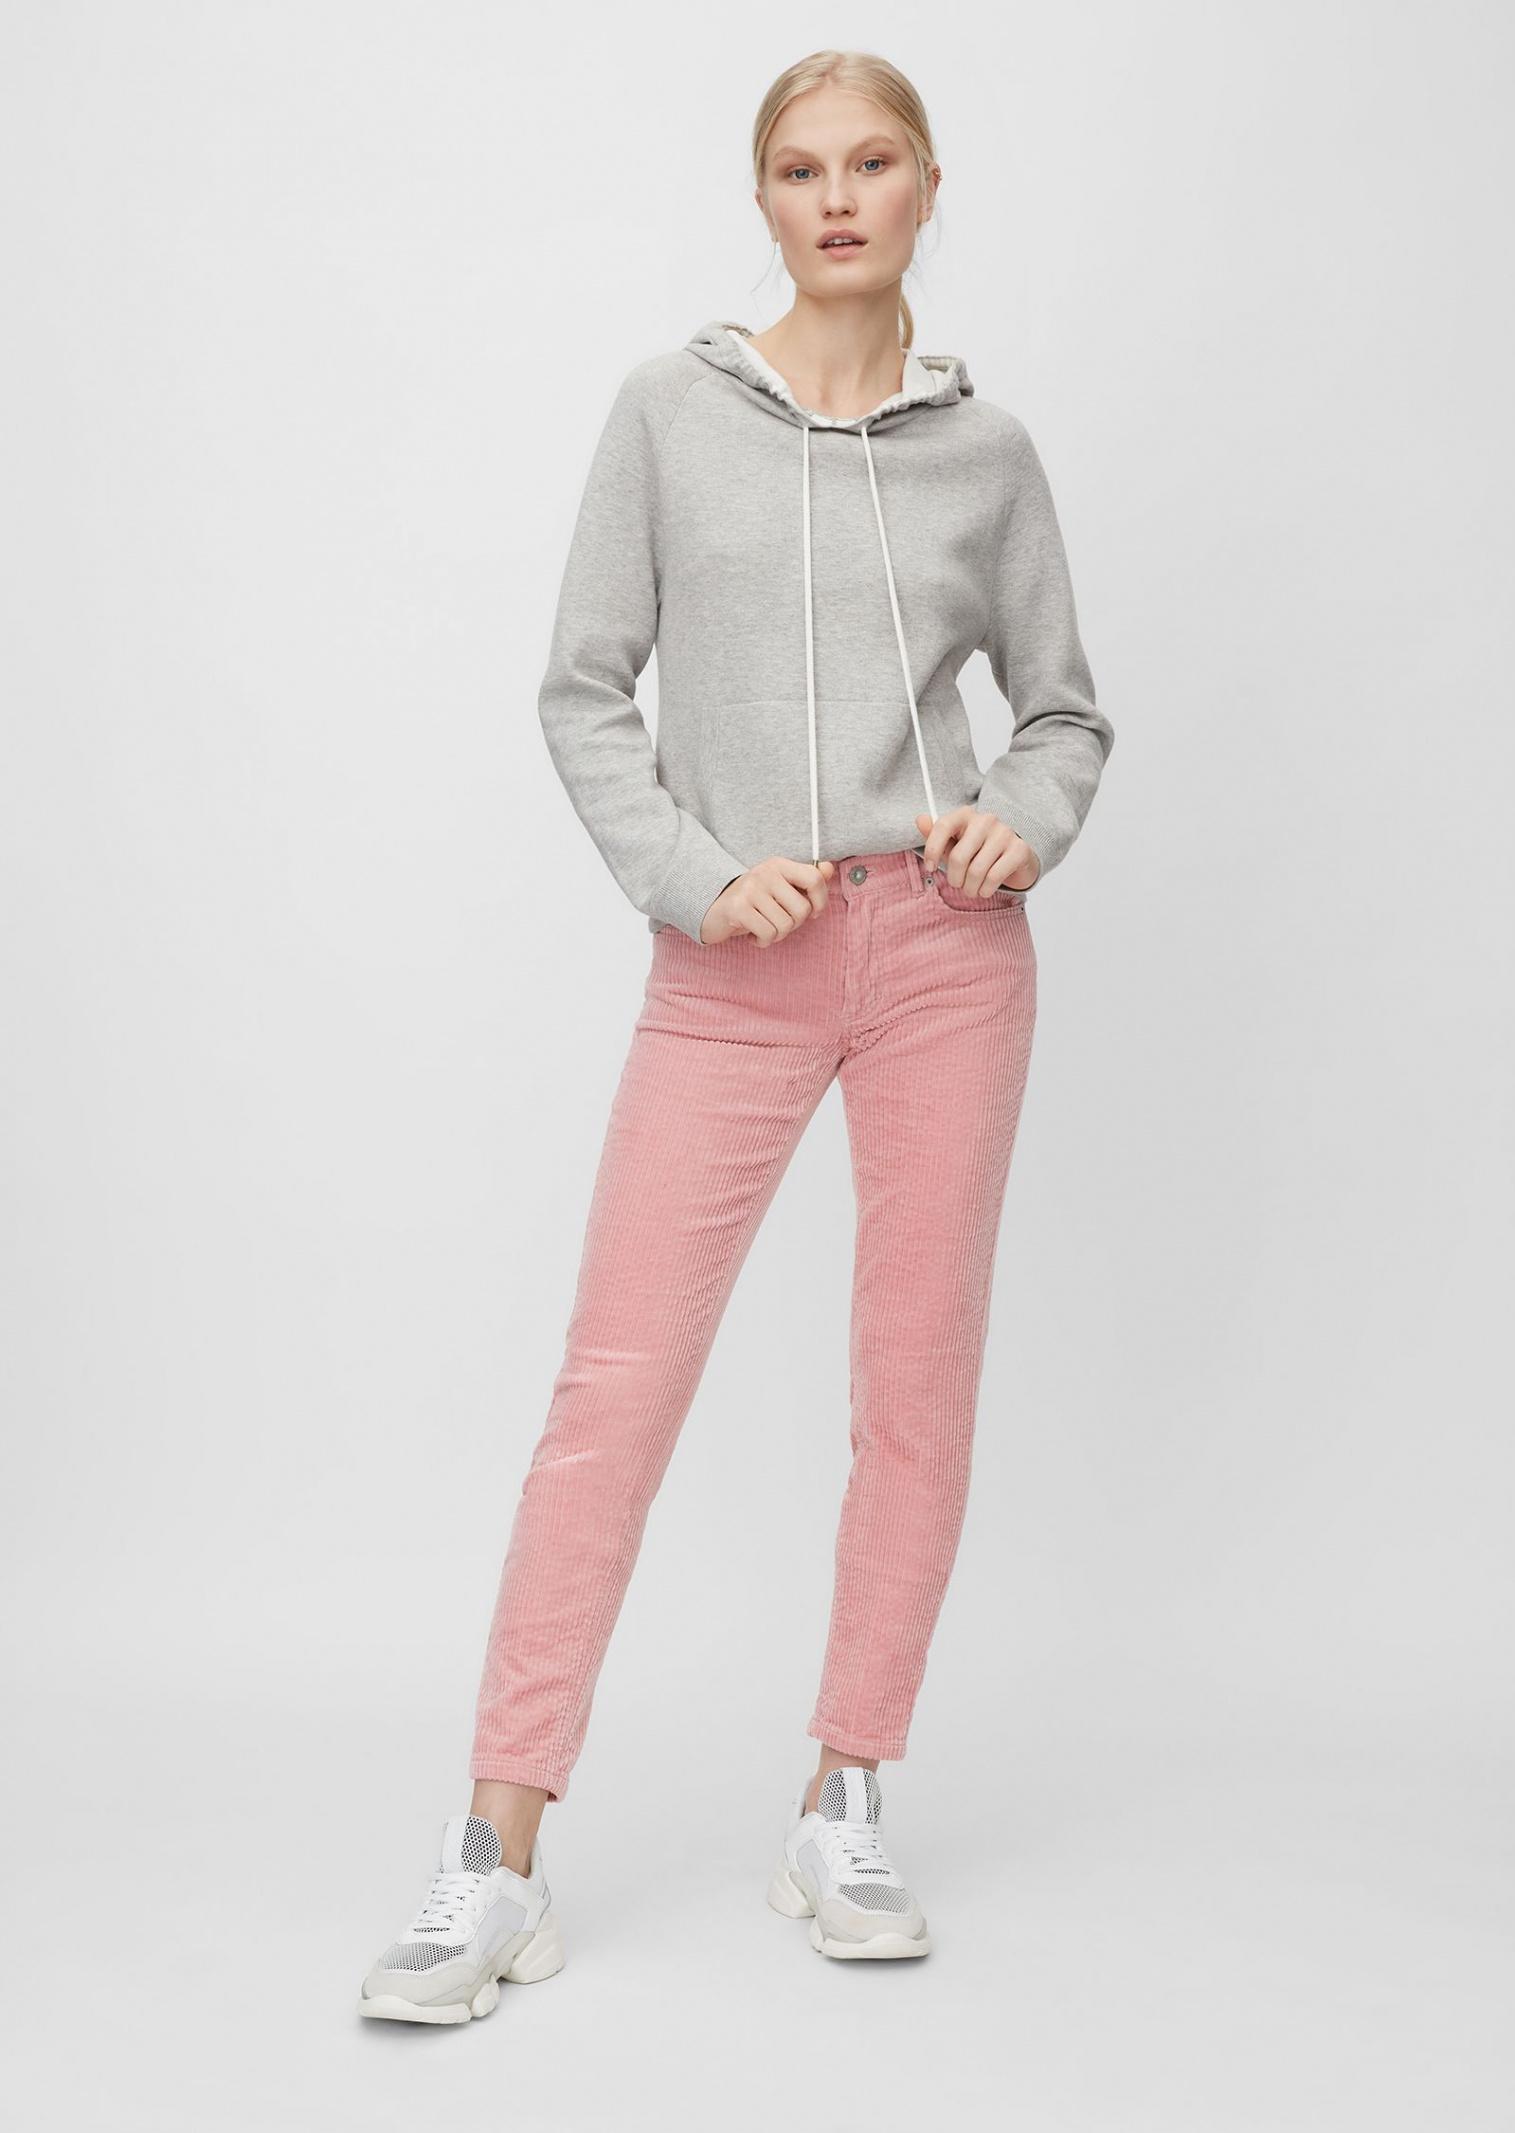 Кофты и свитера женские MARC O'POLO модель PF3951 приобрести, 2017